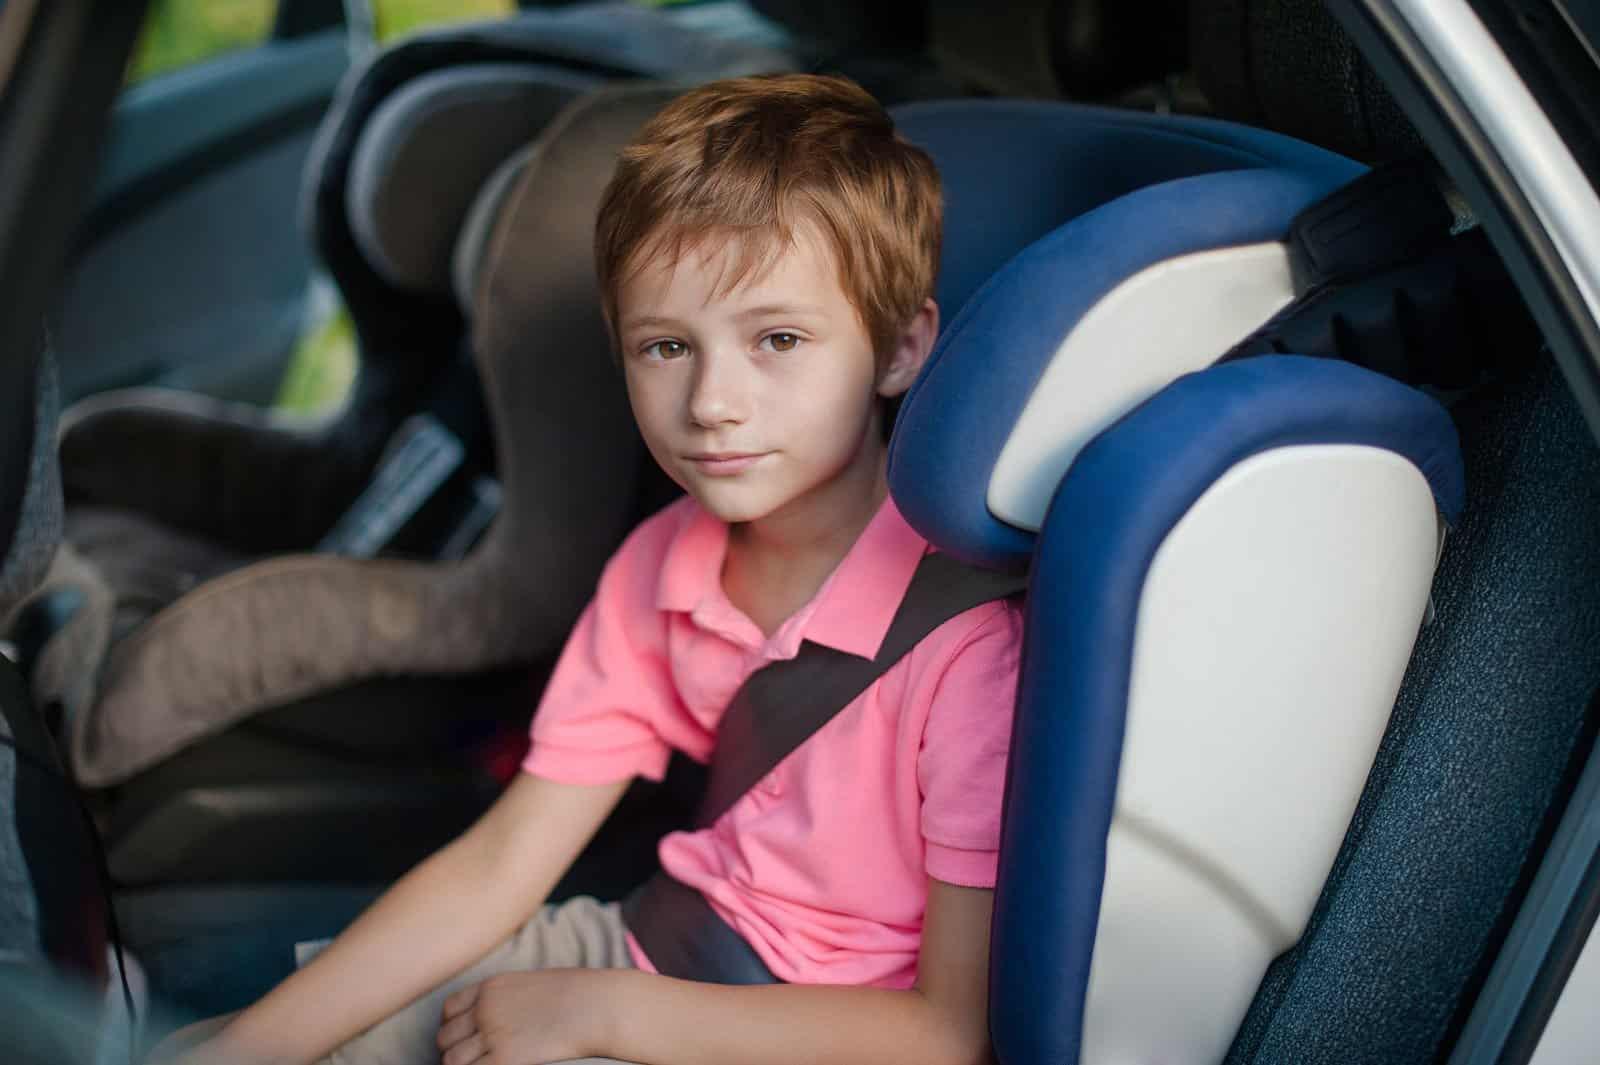 Vermont car seat laws